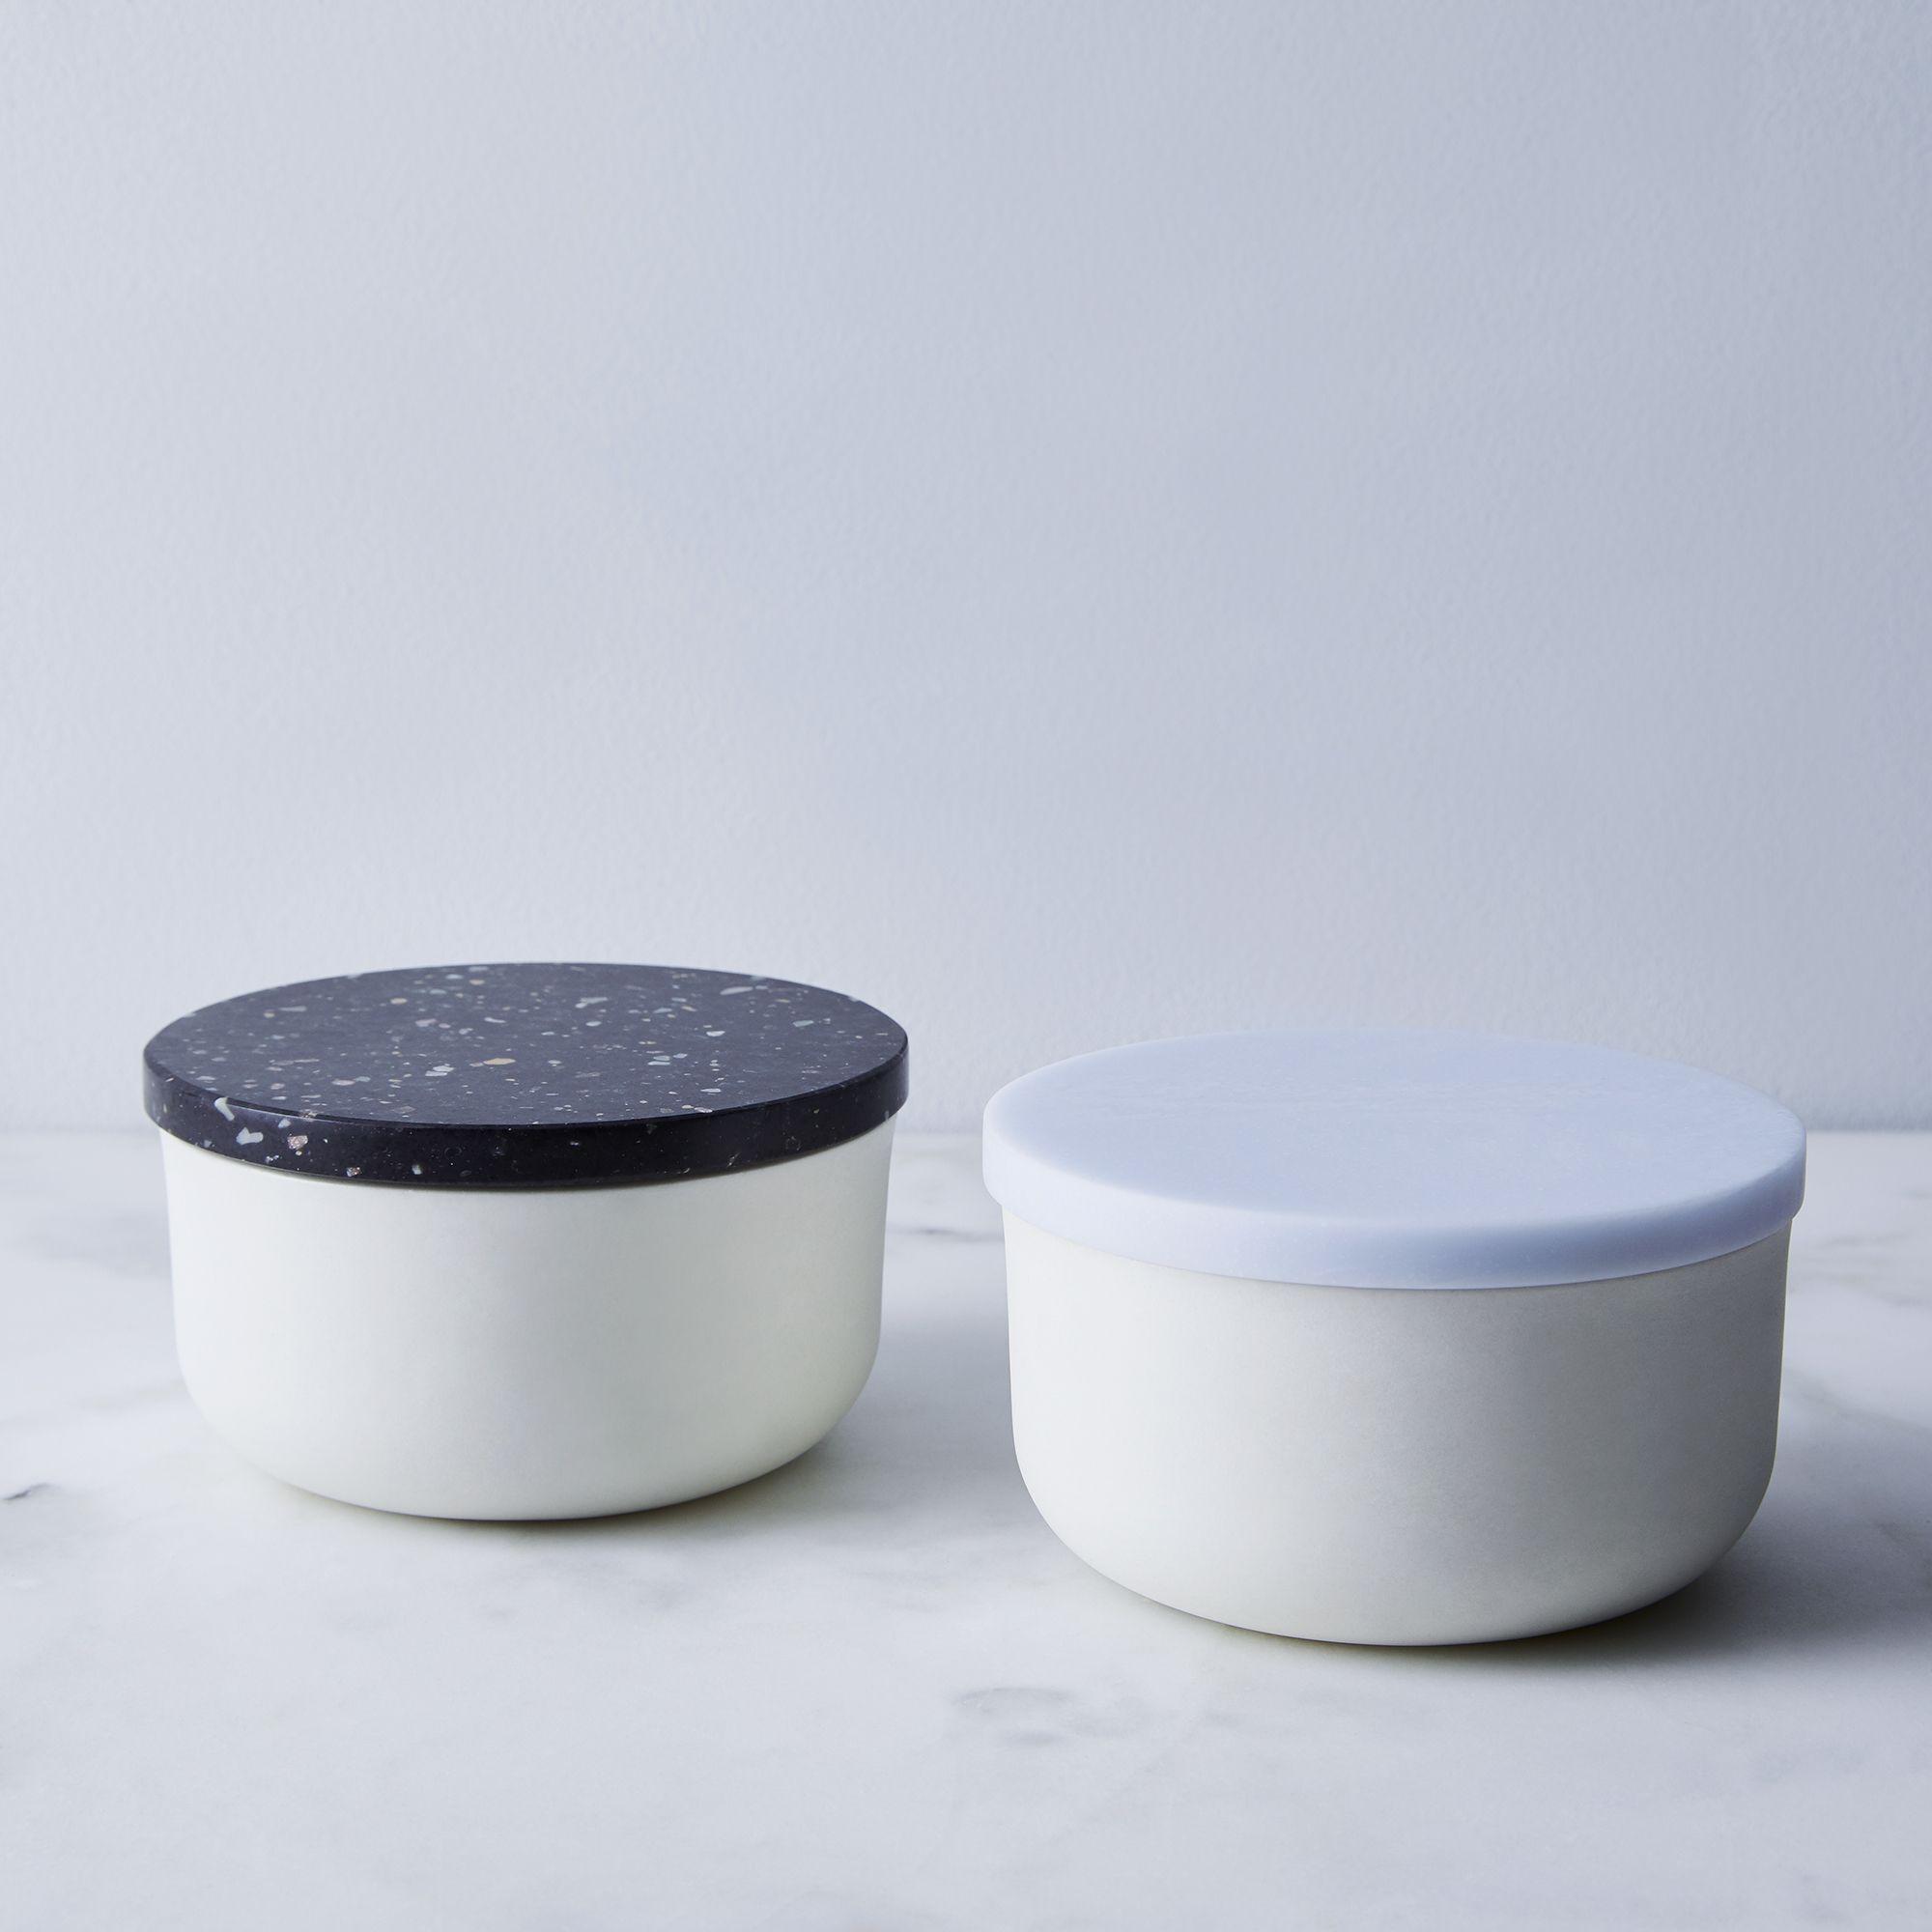 C9a9b95a 9bf2 4c40 a163 77d3747cd62f  2018 0119 jarre corian and ceramic butter keeper family silo ty mecham 004